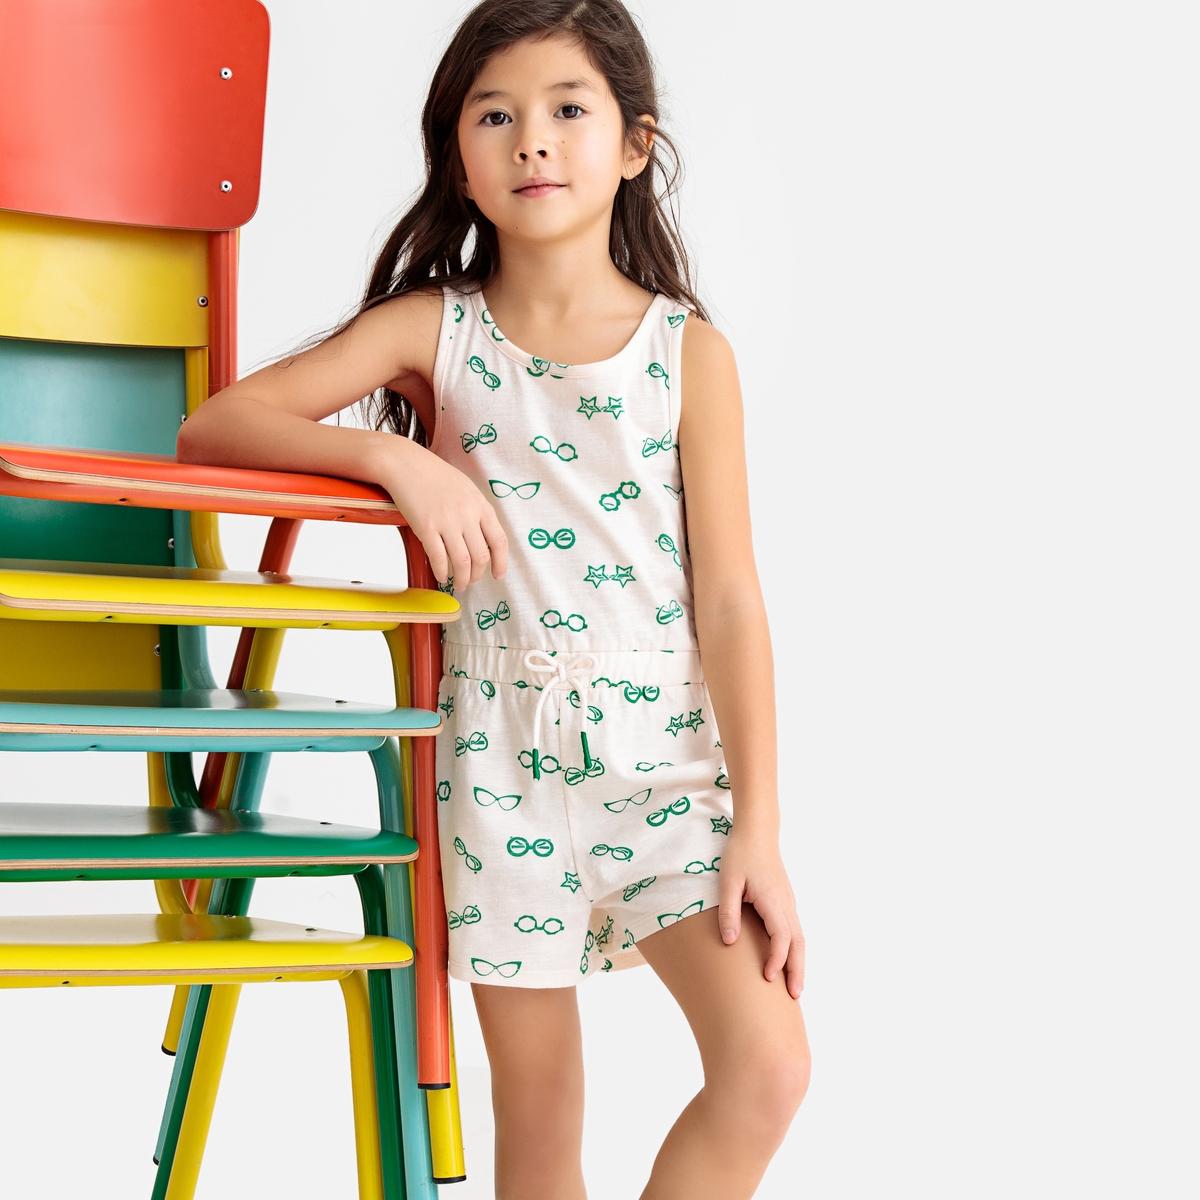 Комбинезон La Redoute С шортами без рукавов с принтом 12 лет -150 см другие пижама la redoute с шортами и цветочным принтом 12 лет 150 см другие